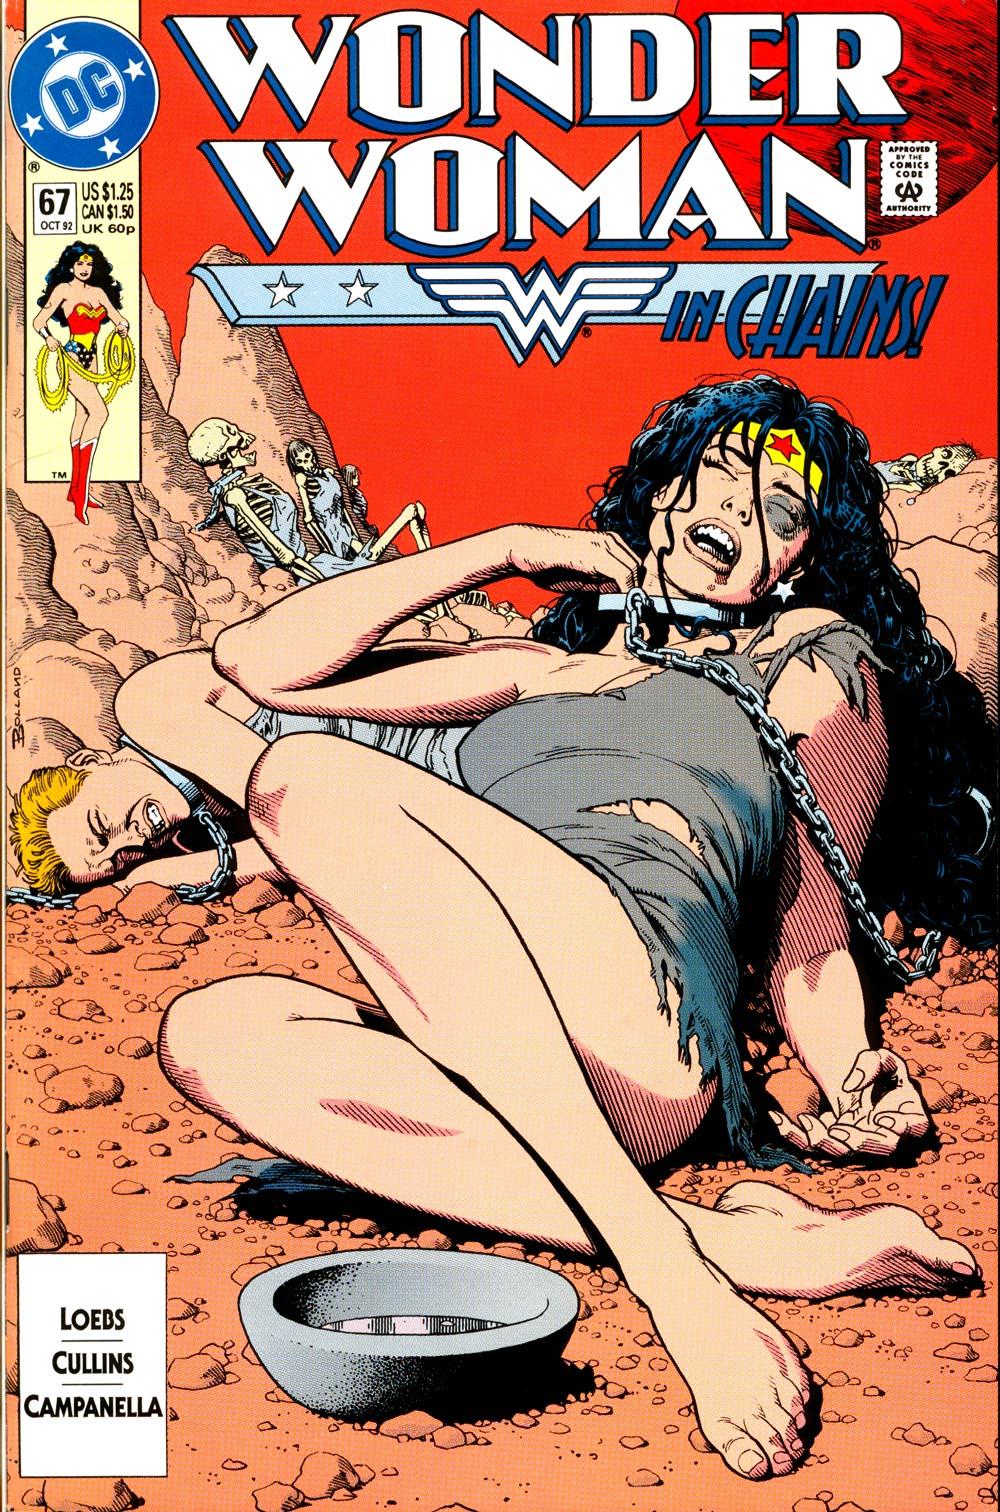 Read online Wonder Woman (1987) comic -  Issue #67 - 1